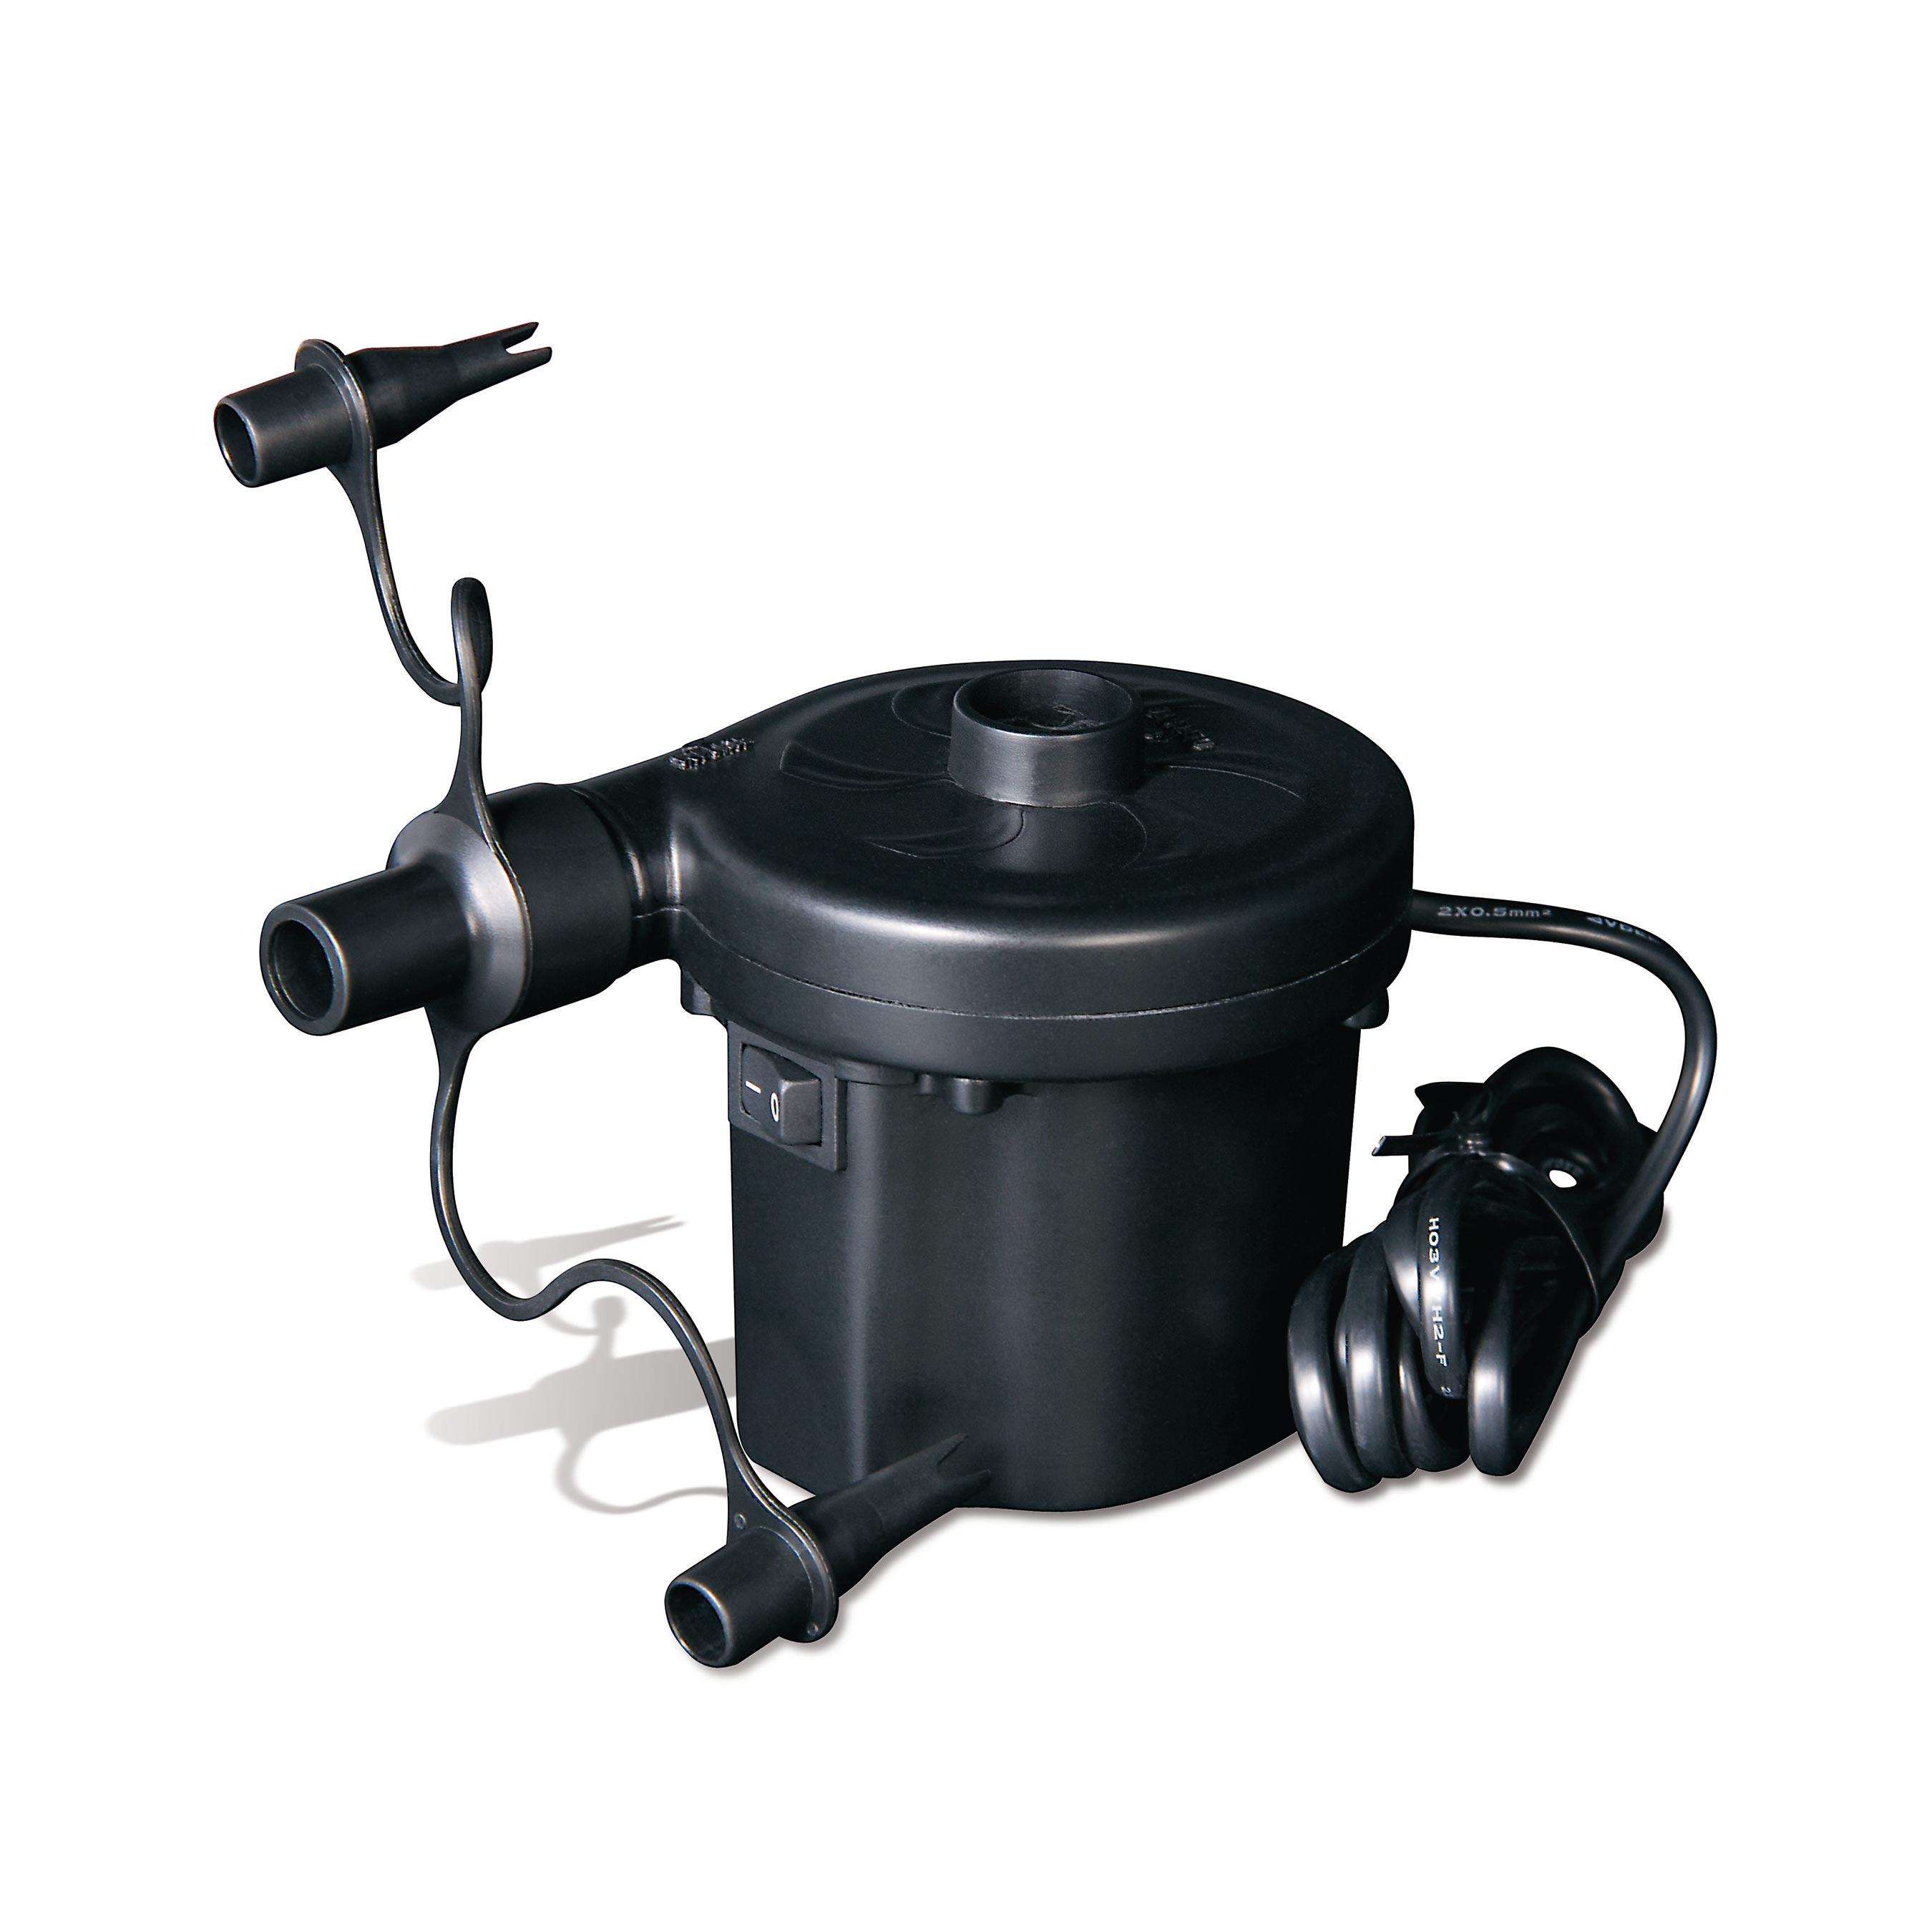 Luftpumpe / Bestway Elektropumpe 230V inkl. Adapter Bild 1